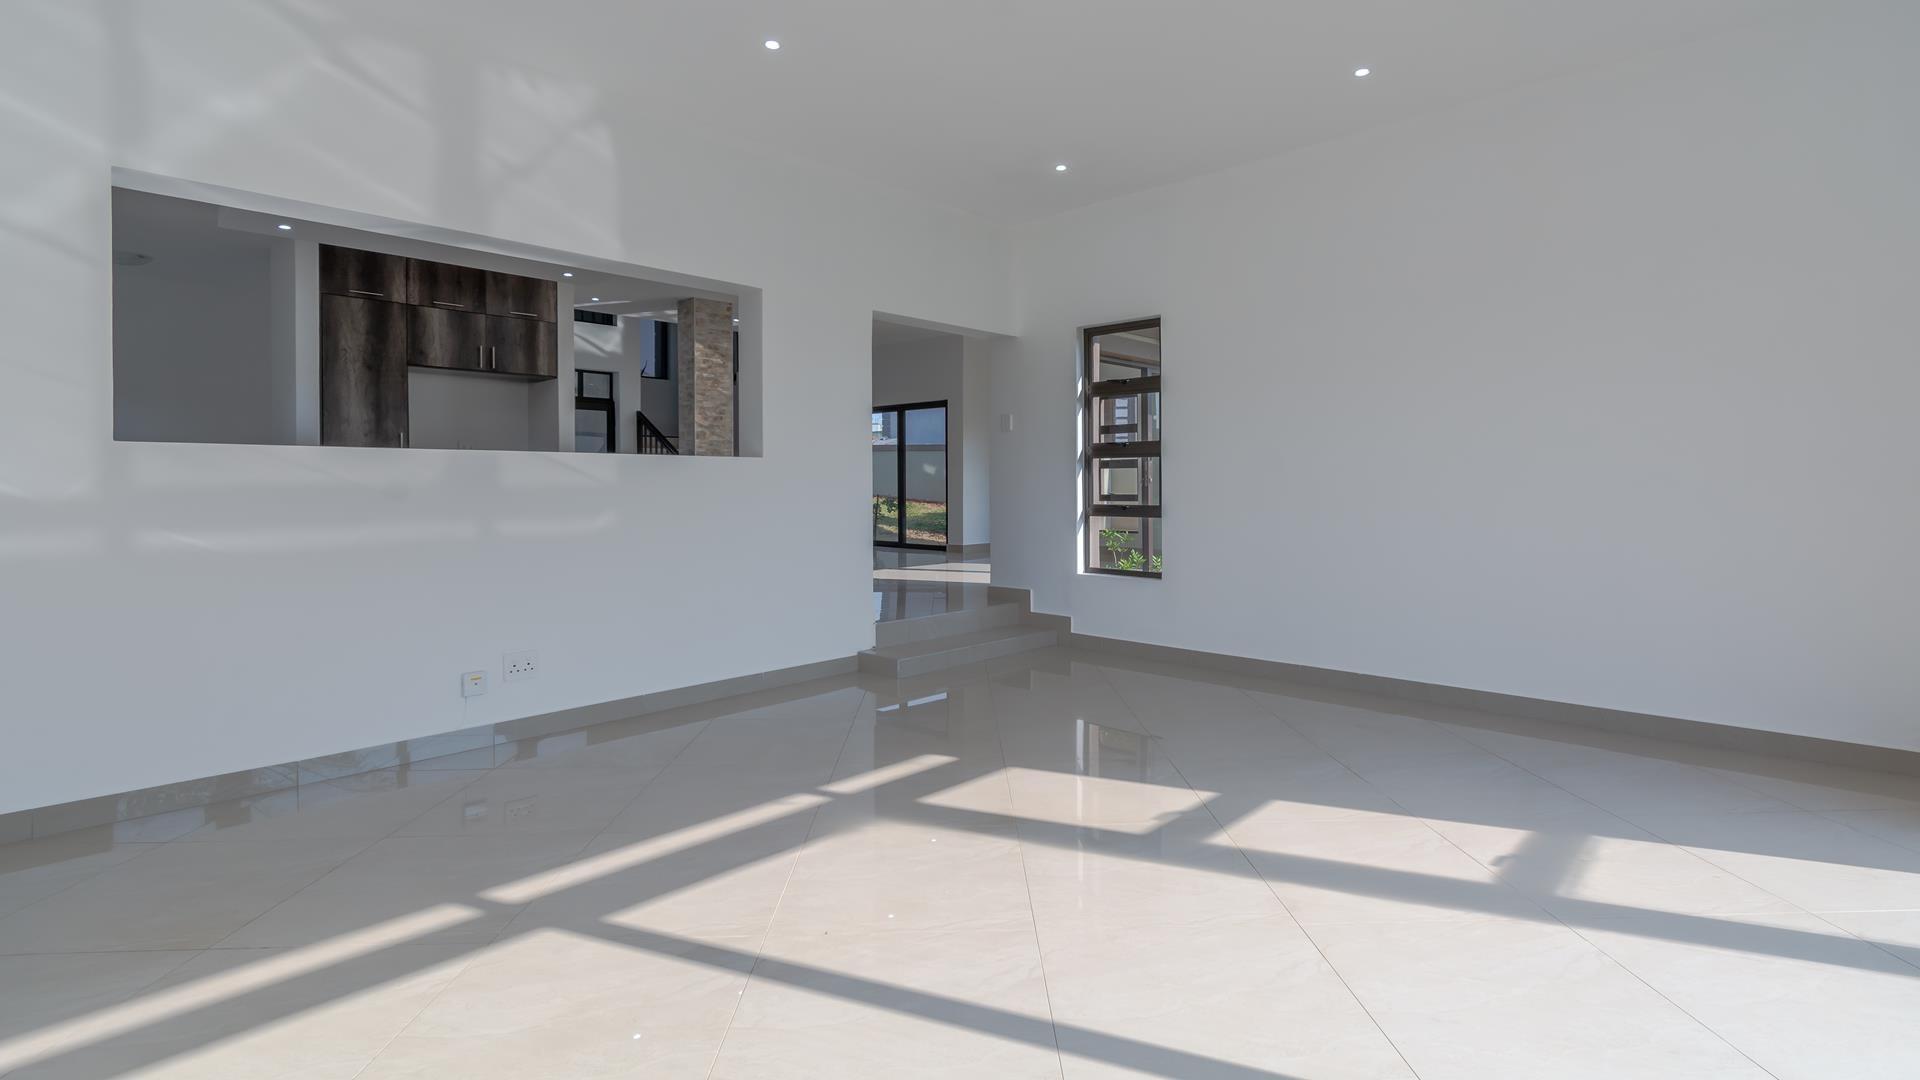 3 Bedroom House For Sale in Desainagar